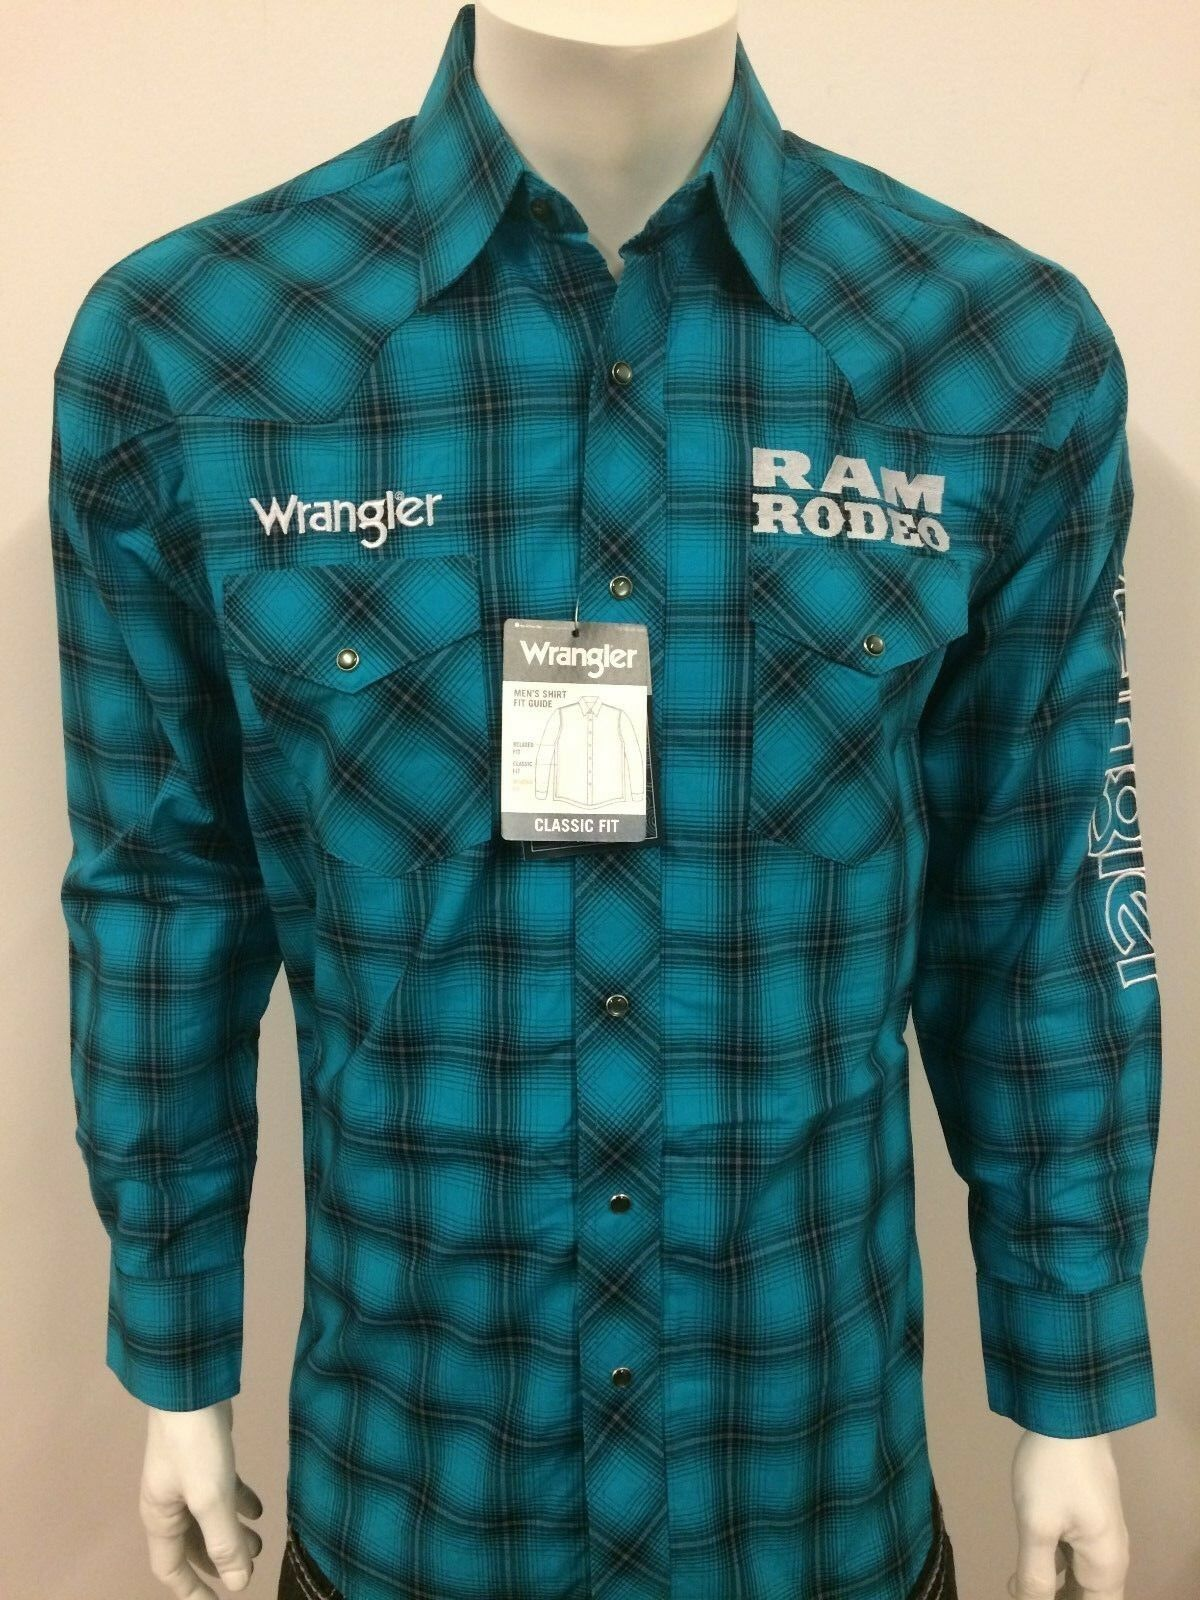 NWT Wrangler Dodge RAM Logo Rodeo Western Embroidered Long Sleeve.(L) Shirt.